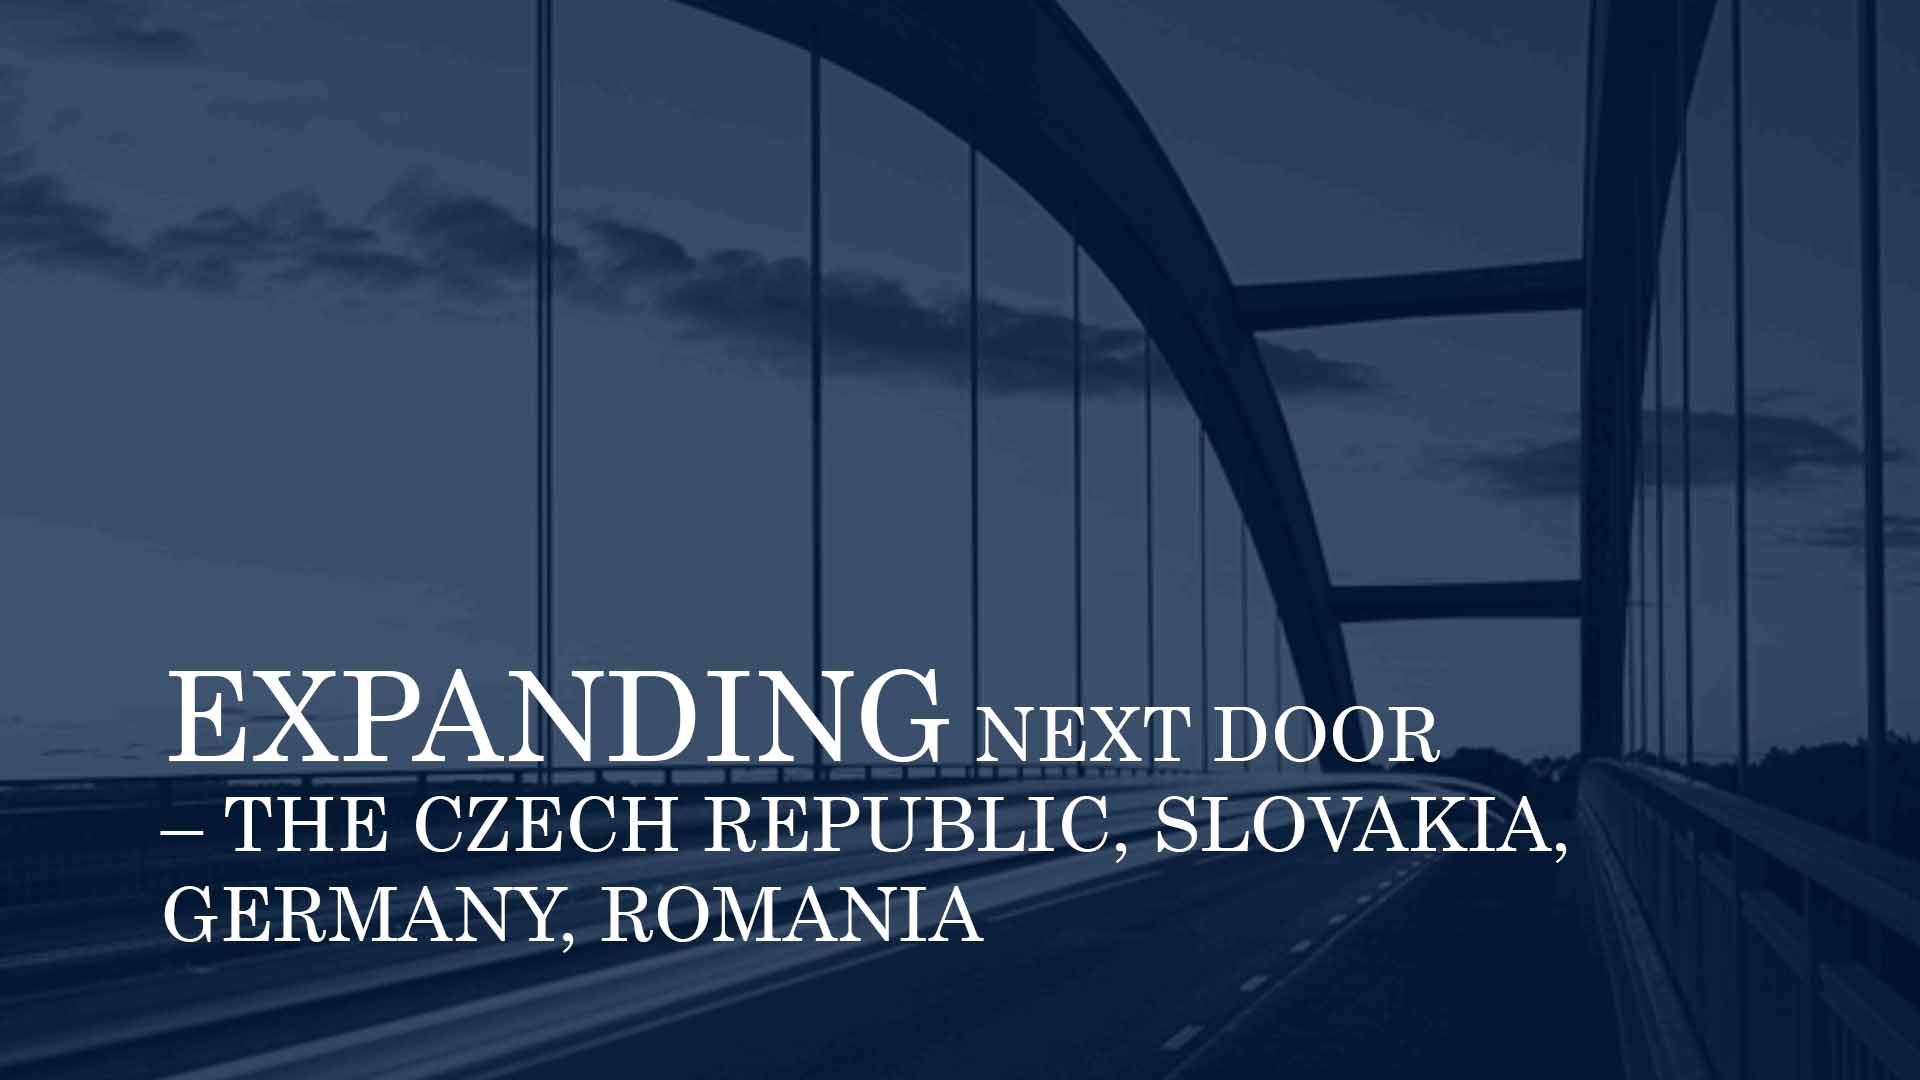 EXPANDING NEXT DOOR – THE CZECH REPUBLIC, SLOVAKIA, GERMANY, ROMANIA